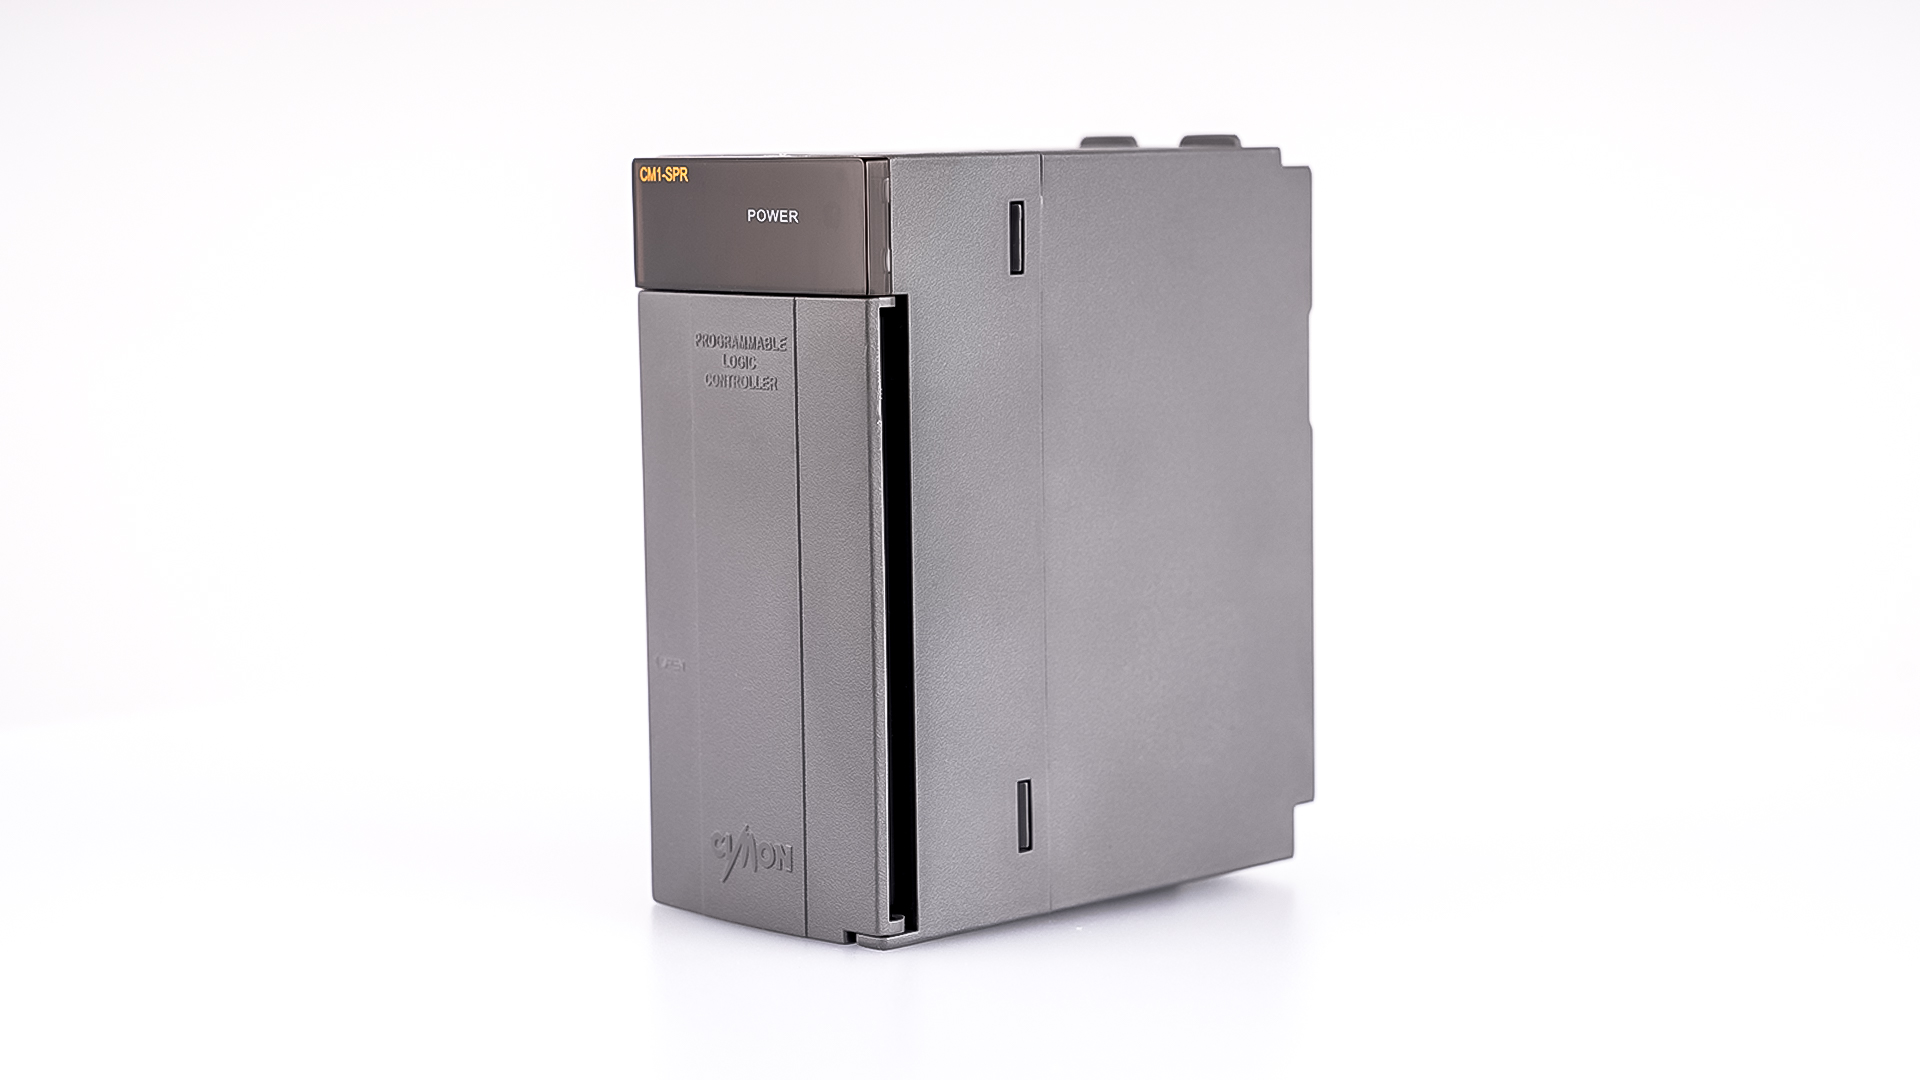 PLC_CM1-SPR_Power_4